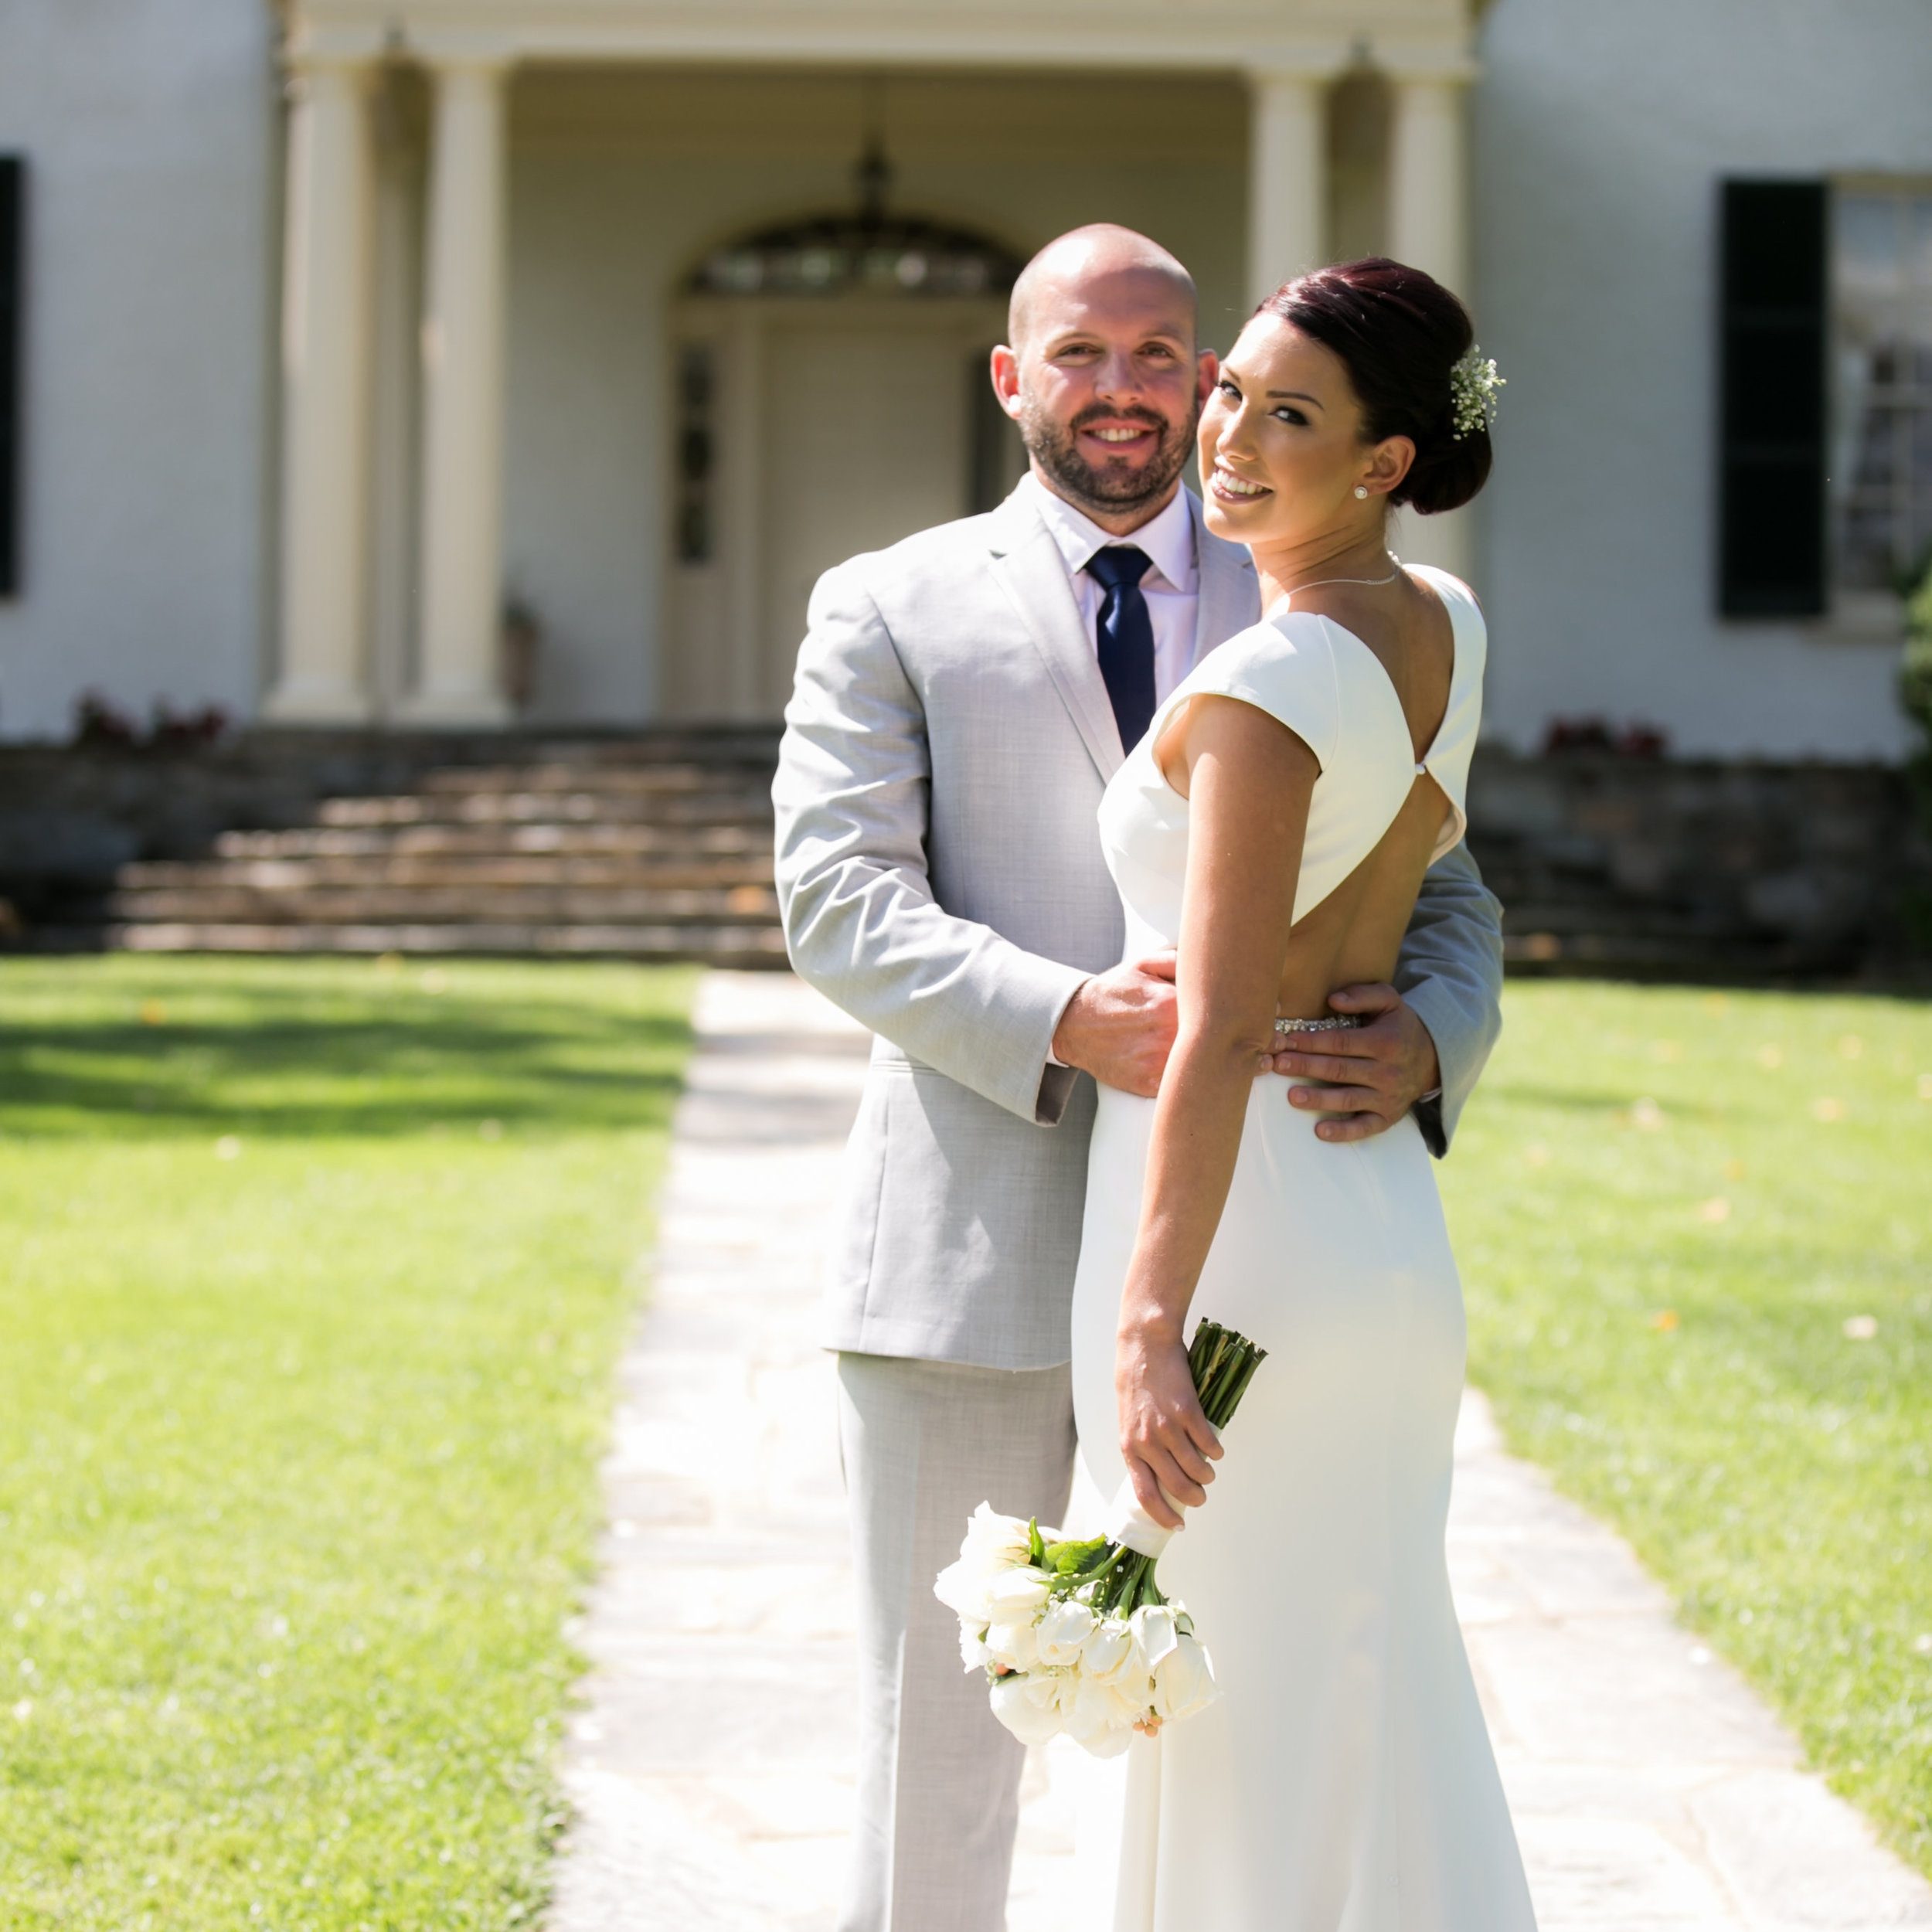 Pure elegance events Tynise Kee dc wedding planner va wedding planner rust manor house leesburg -0018.jpg